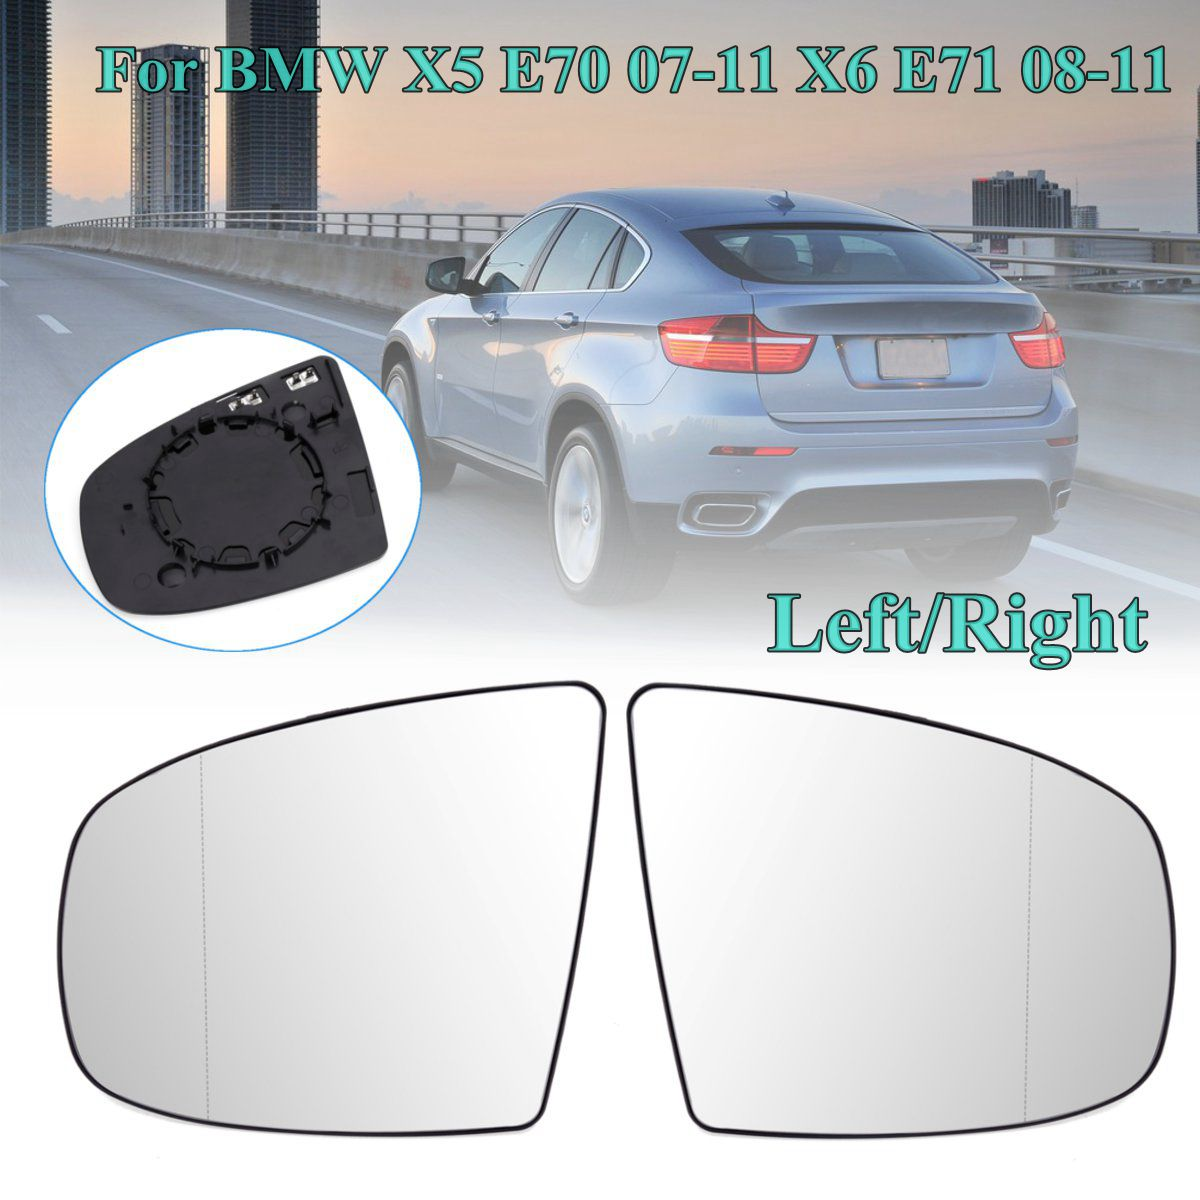 Wing Door Heated Mirror Glass Side Electric Heated Wing Mirror Glass For BMW X5 E70 07-11 X6 E71 08-14